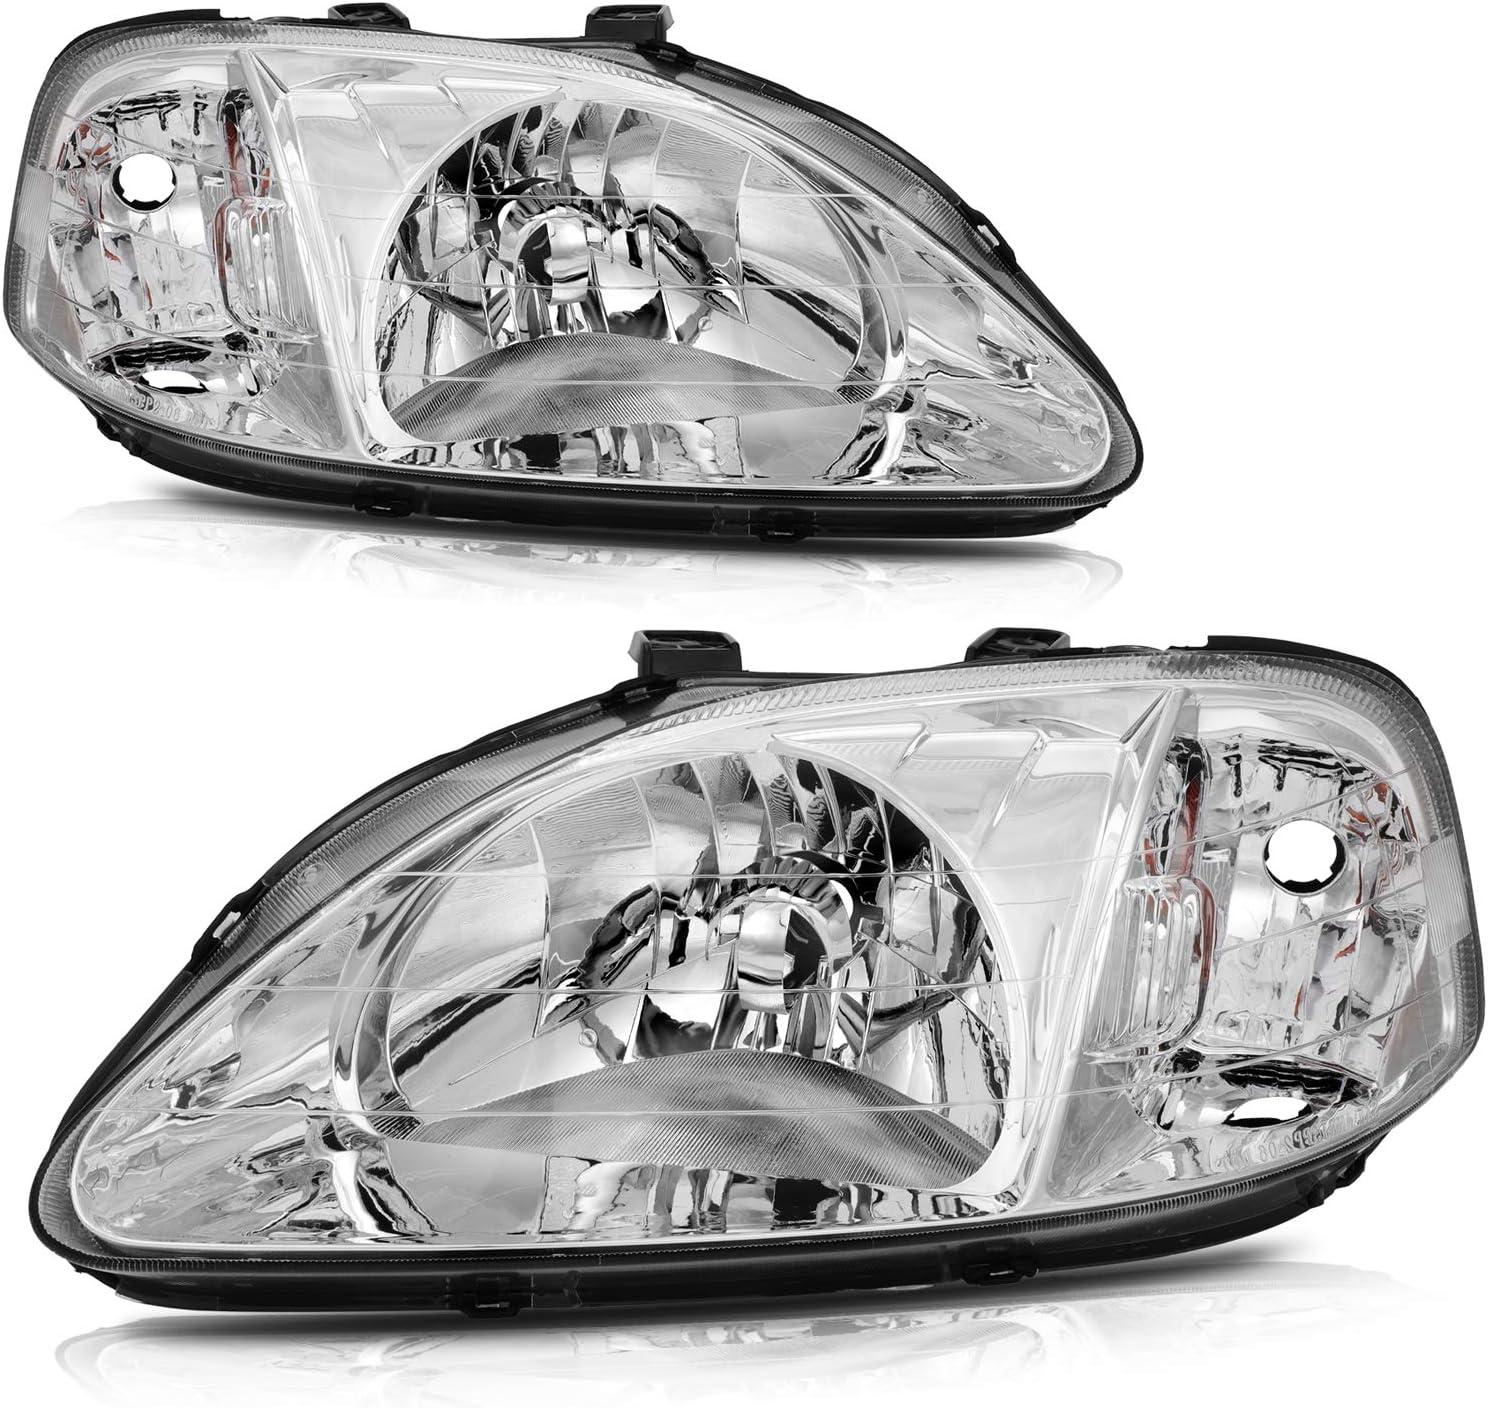 LBRST Headlight Assembly Fit For Civic Chrome High Virginia Beach Mall order 1999-2000 Ho Honda